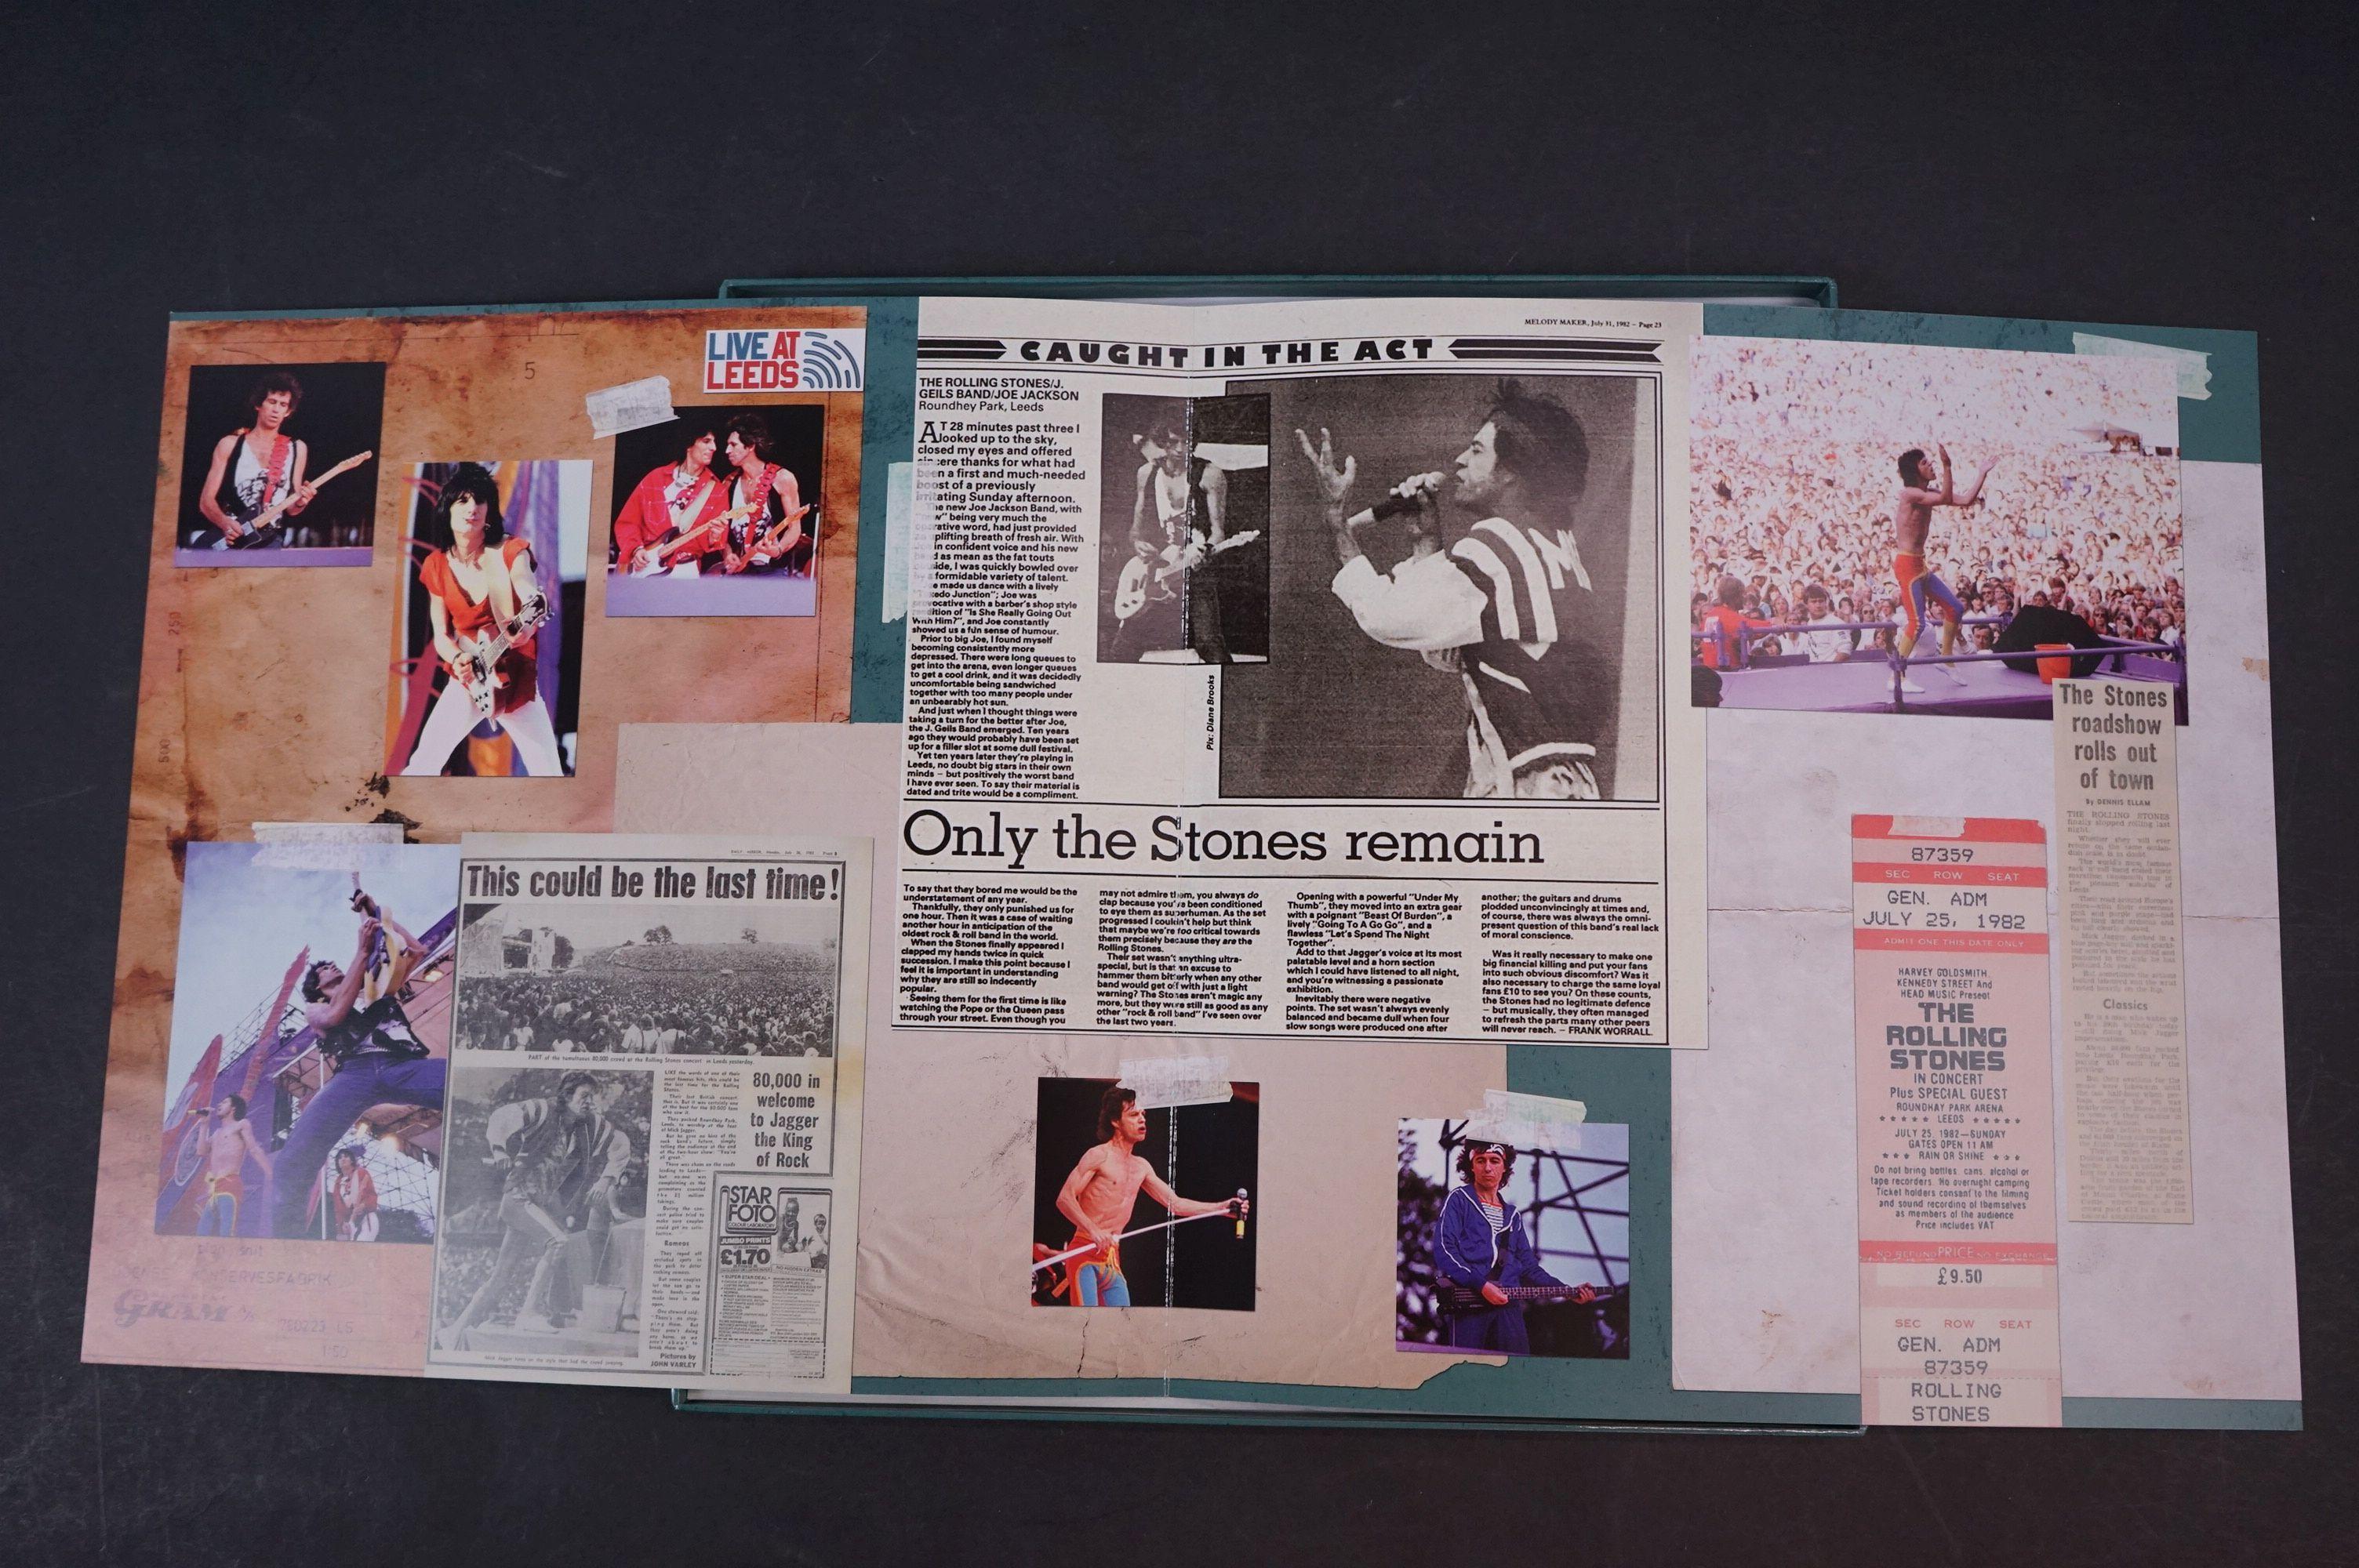 Vinyl - ltd edn The Real Alternate Album Rolling Stones Leeds July 25 1982 3 LP / 2 CD Box Set RTR - Image 4 of 10